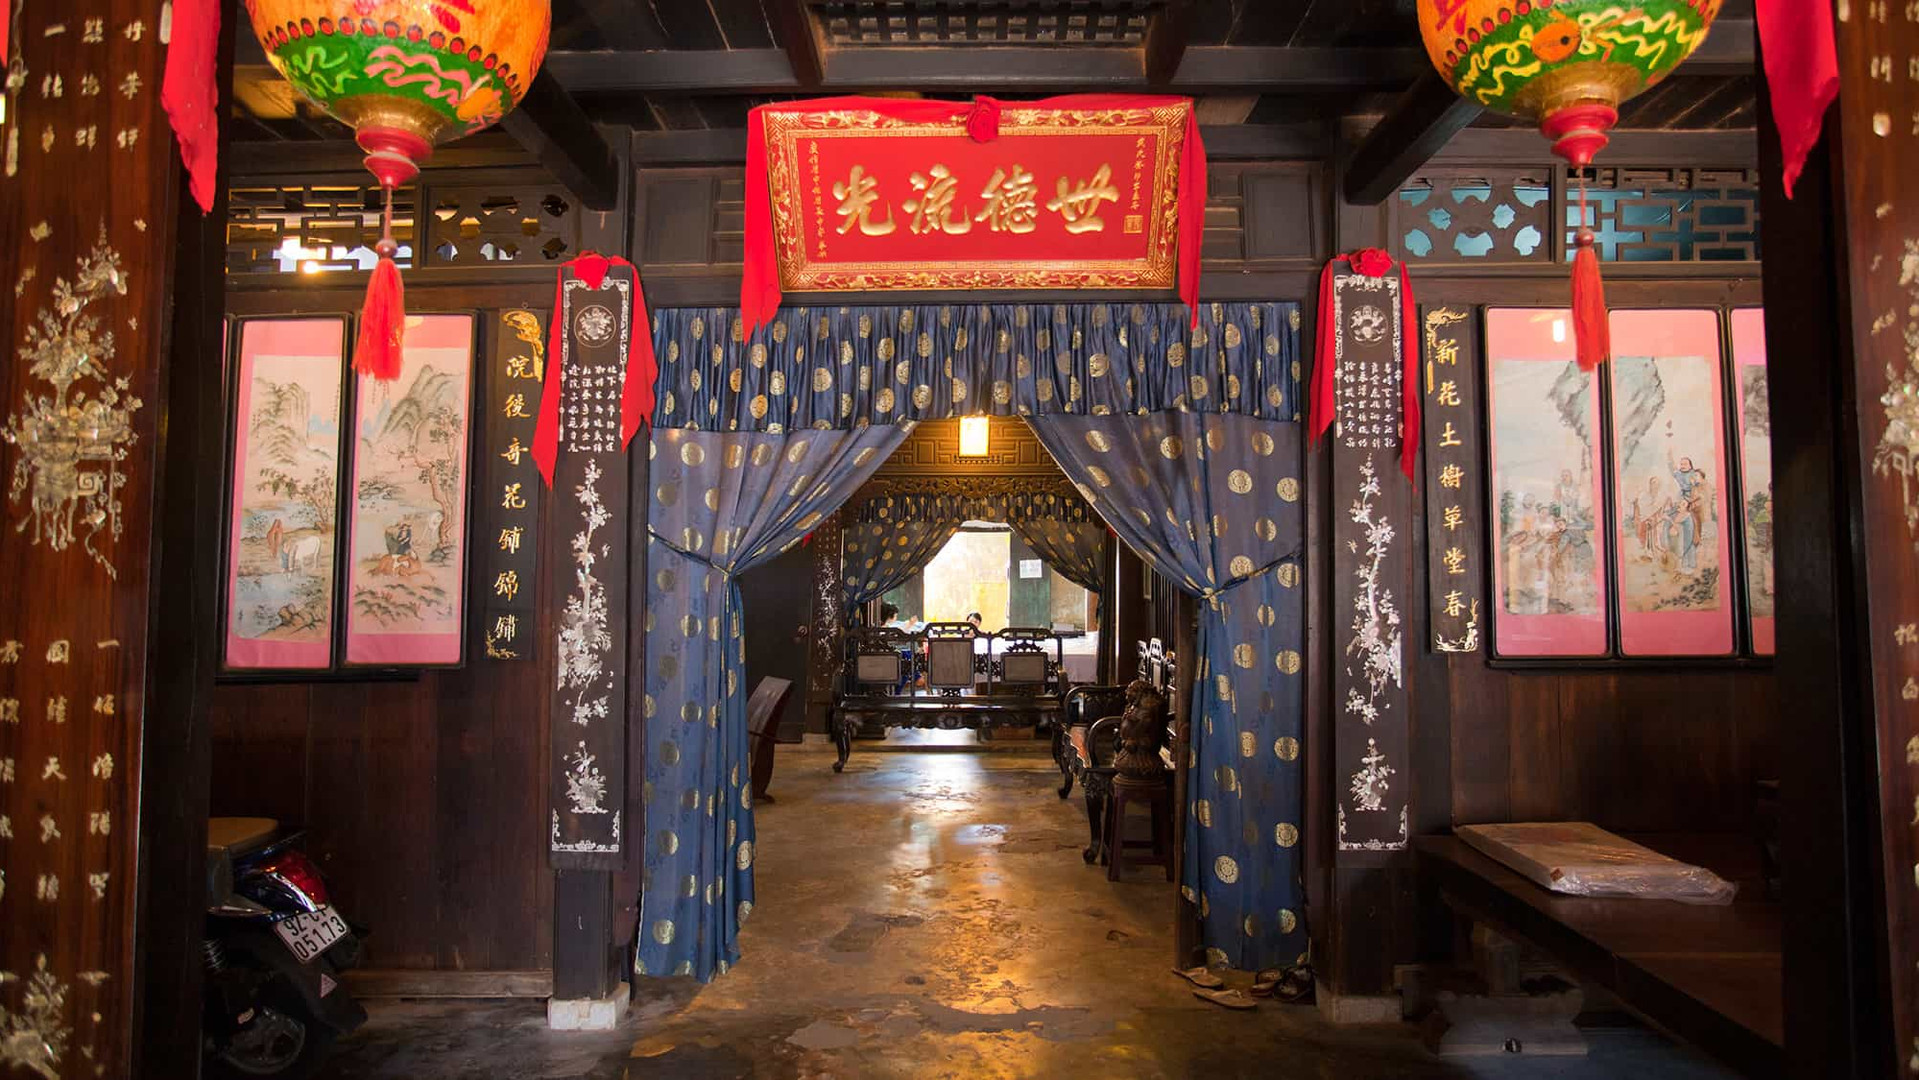 Hoi-An-Travel-Phung-Hung-Old-House.jpg